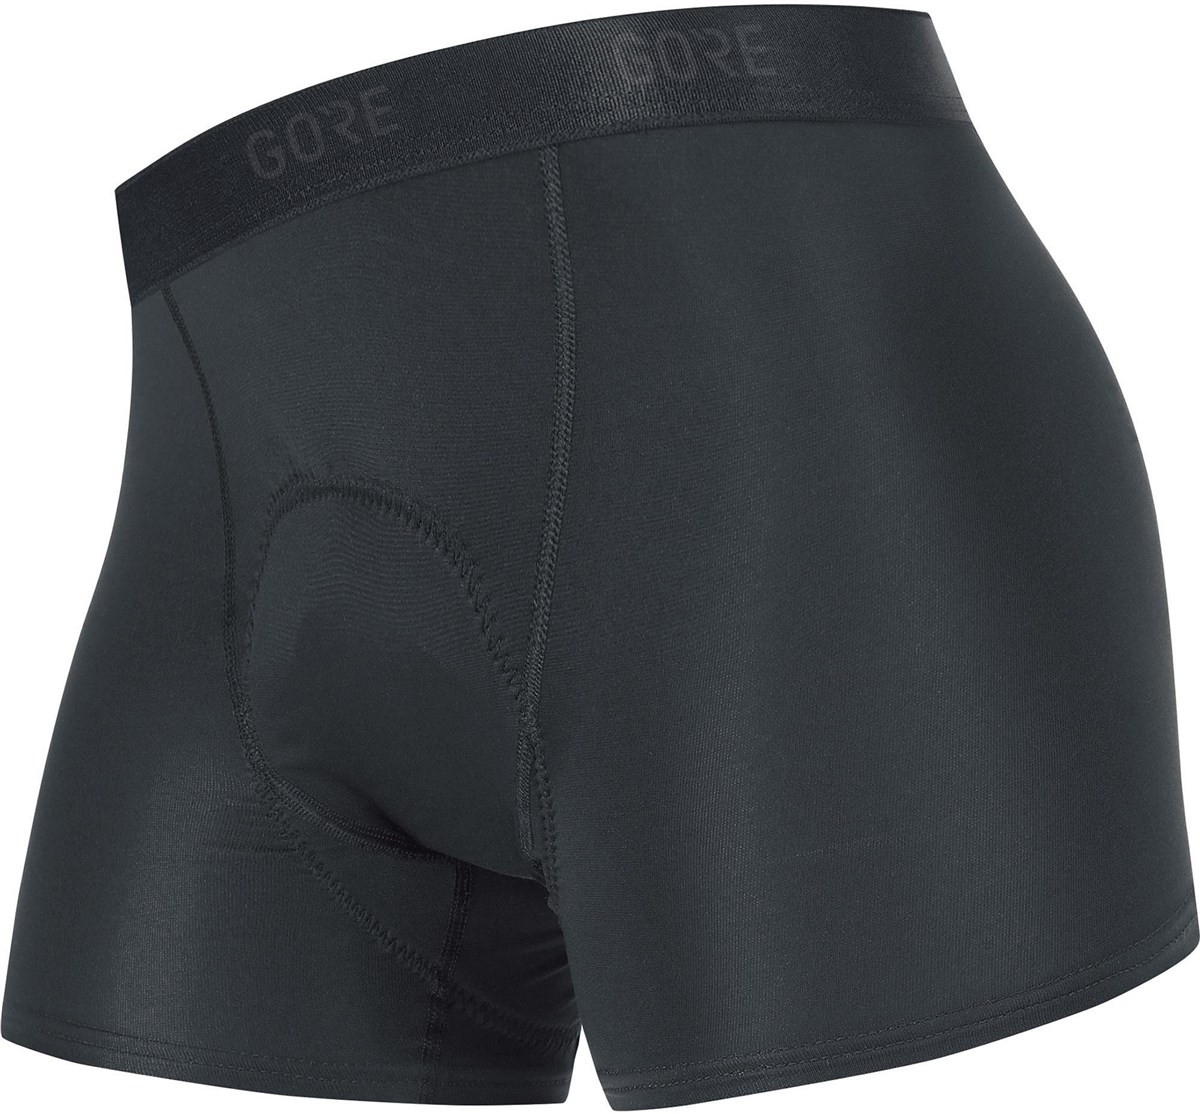 Gore C3 Shorty Womens Boxer Base Layer | Undertøj og svedtøj